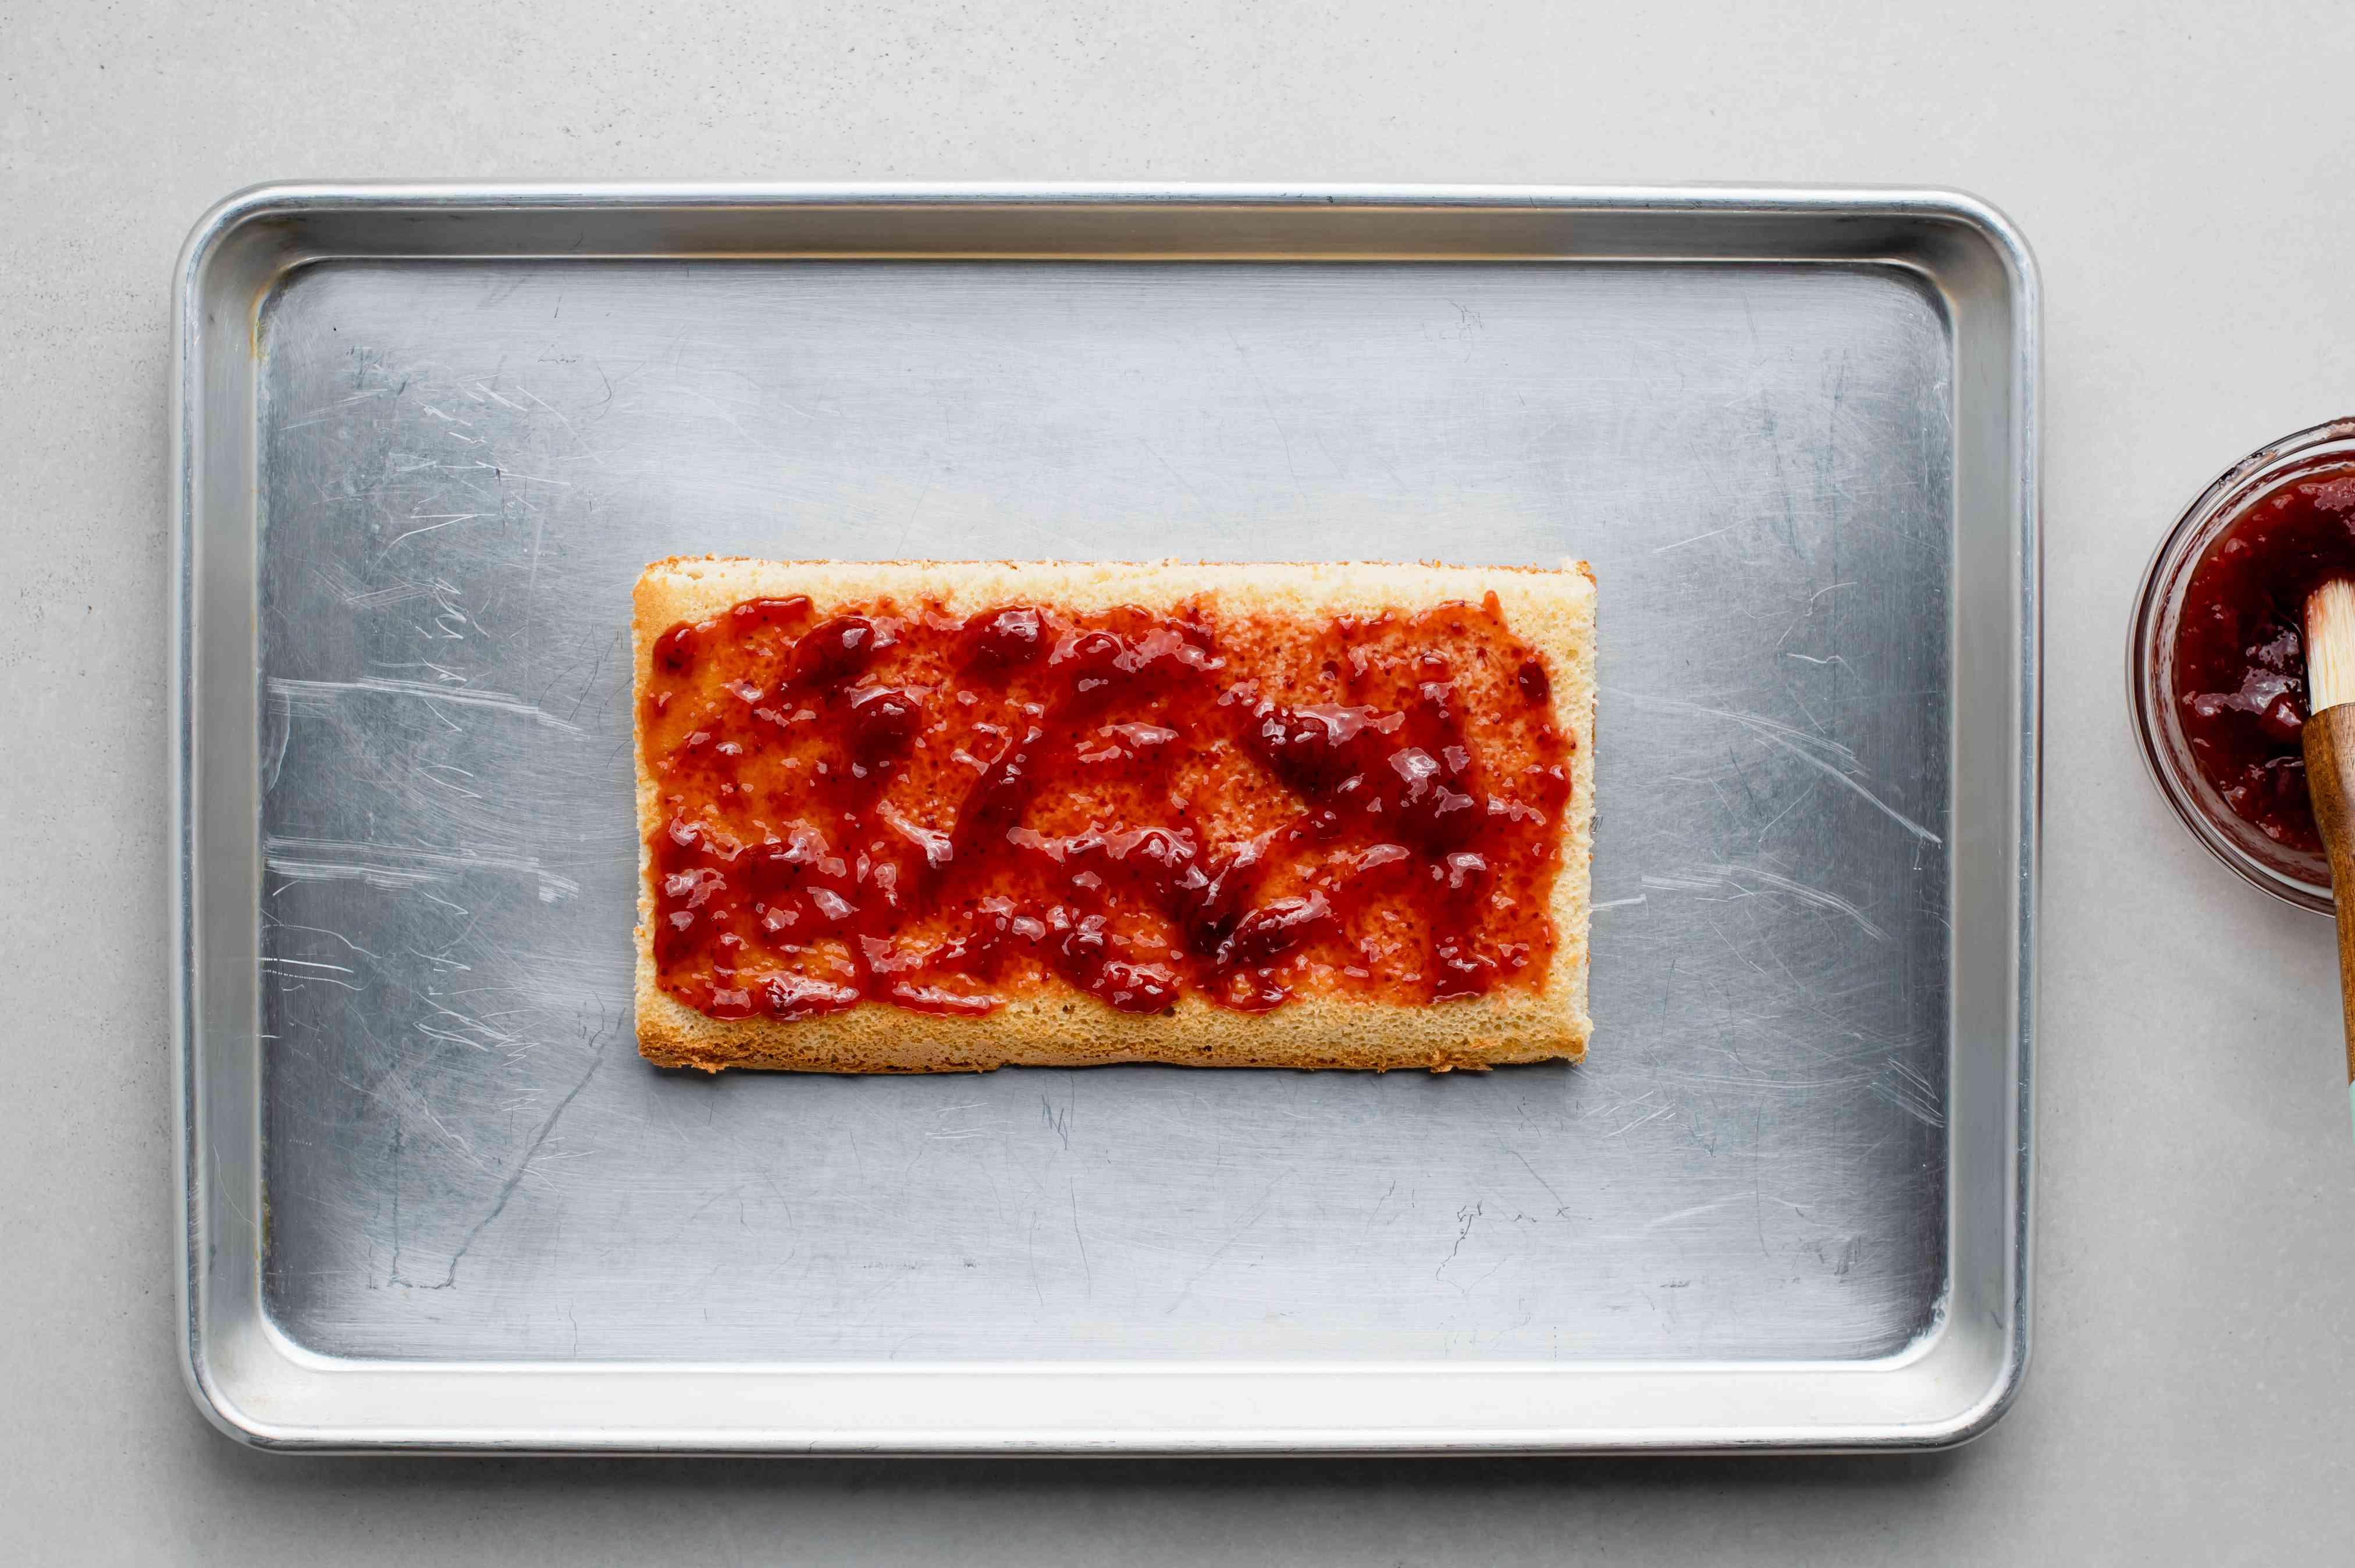 jam brushed over the cake on a baking sheet